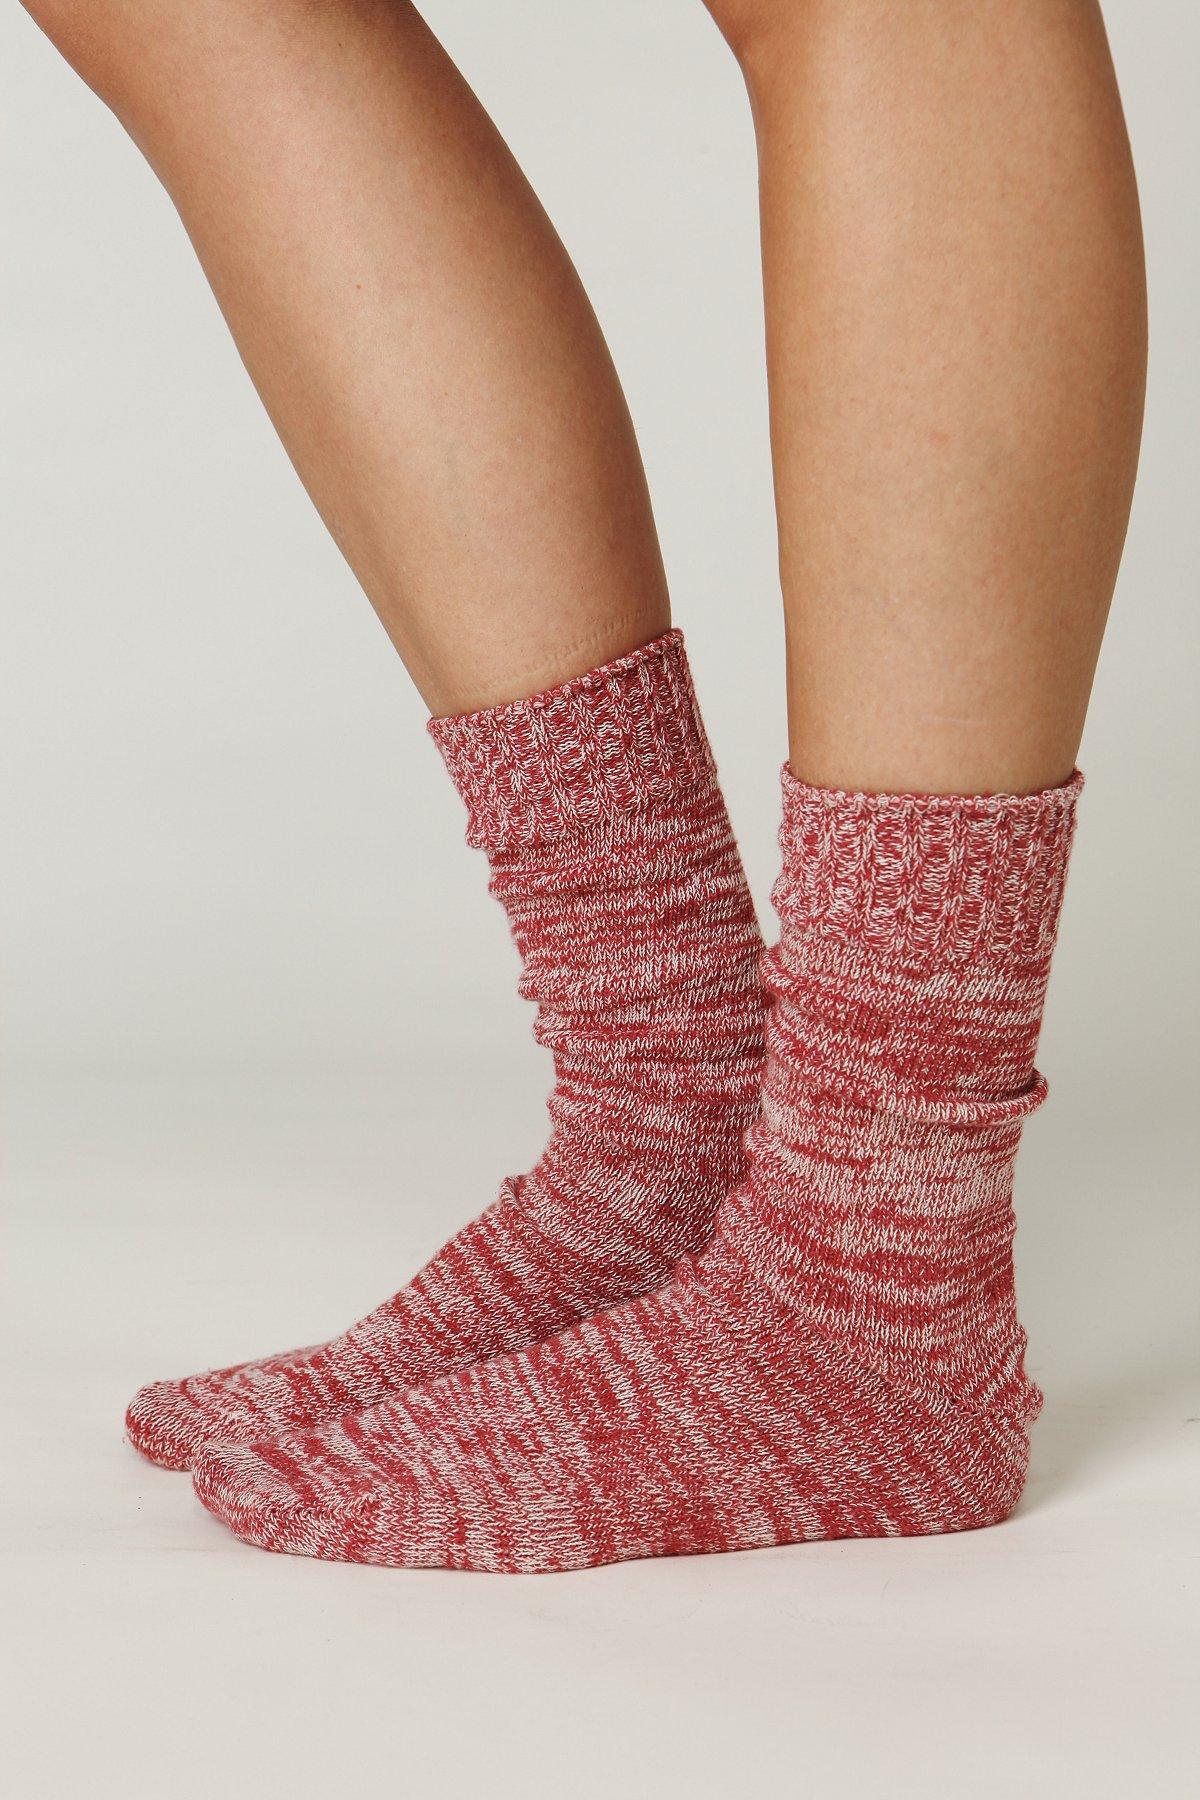 Cotton Spacedye Boot Sock